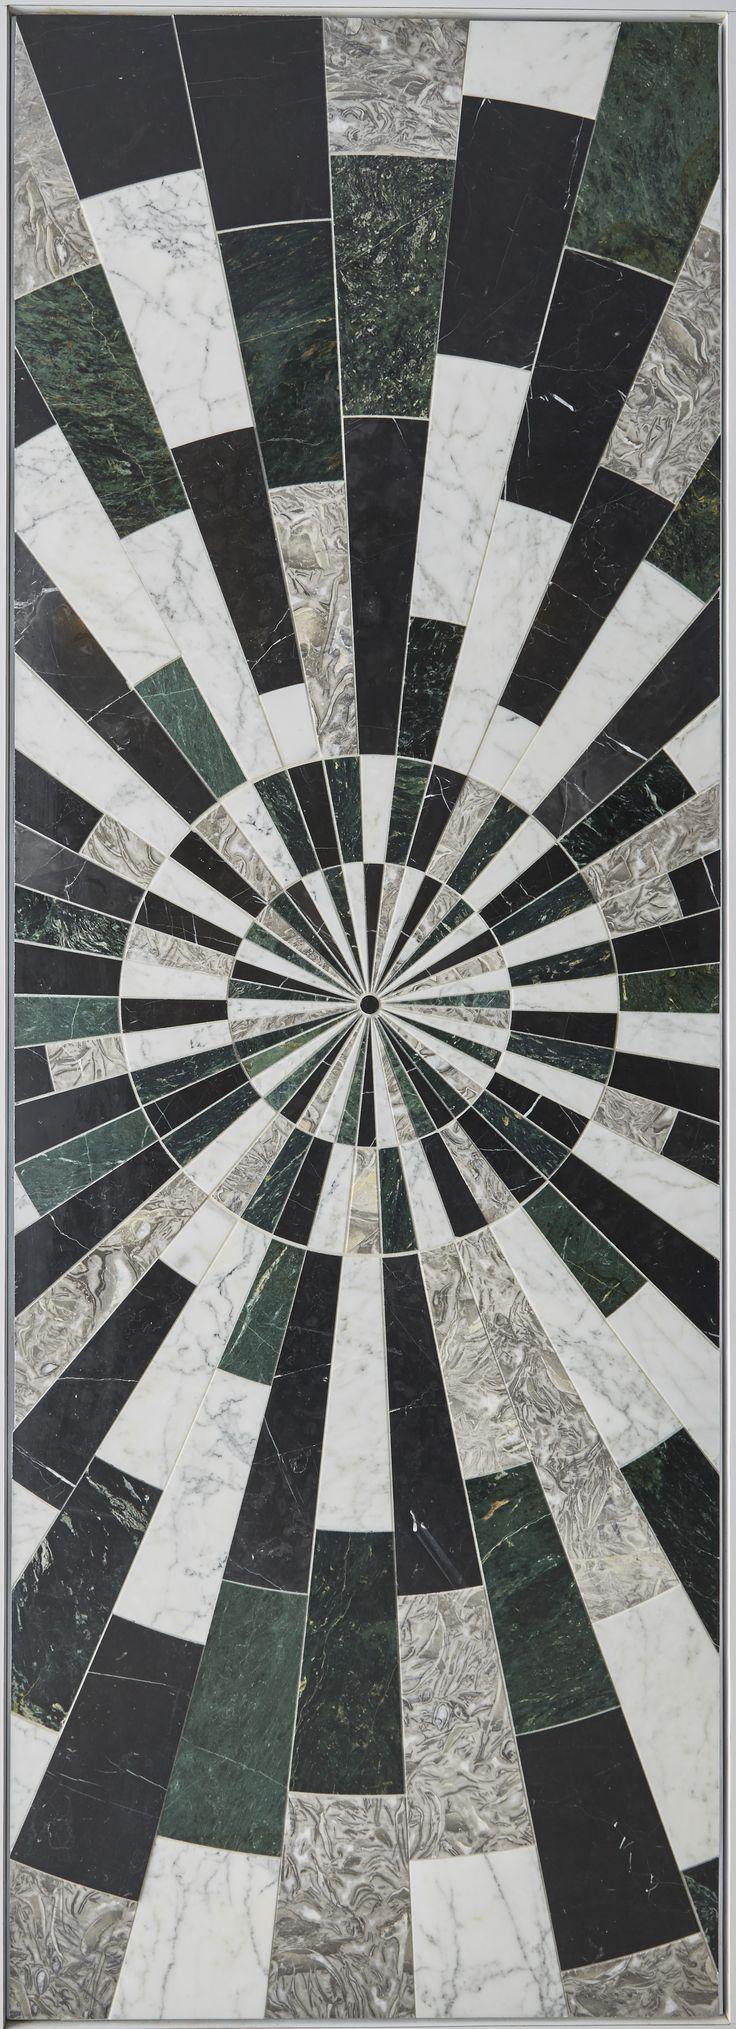 KELLY WEARSTLER X ANN SACKS. 'Liaison Palm' stone patterned tiles